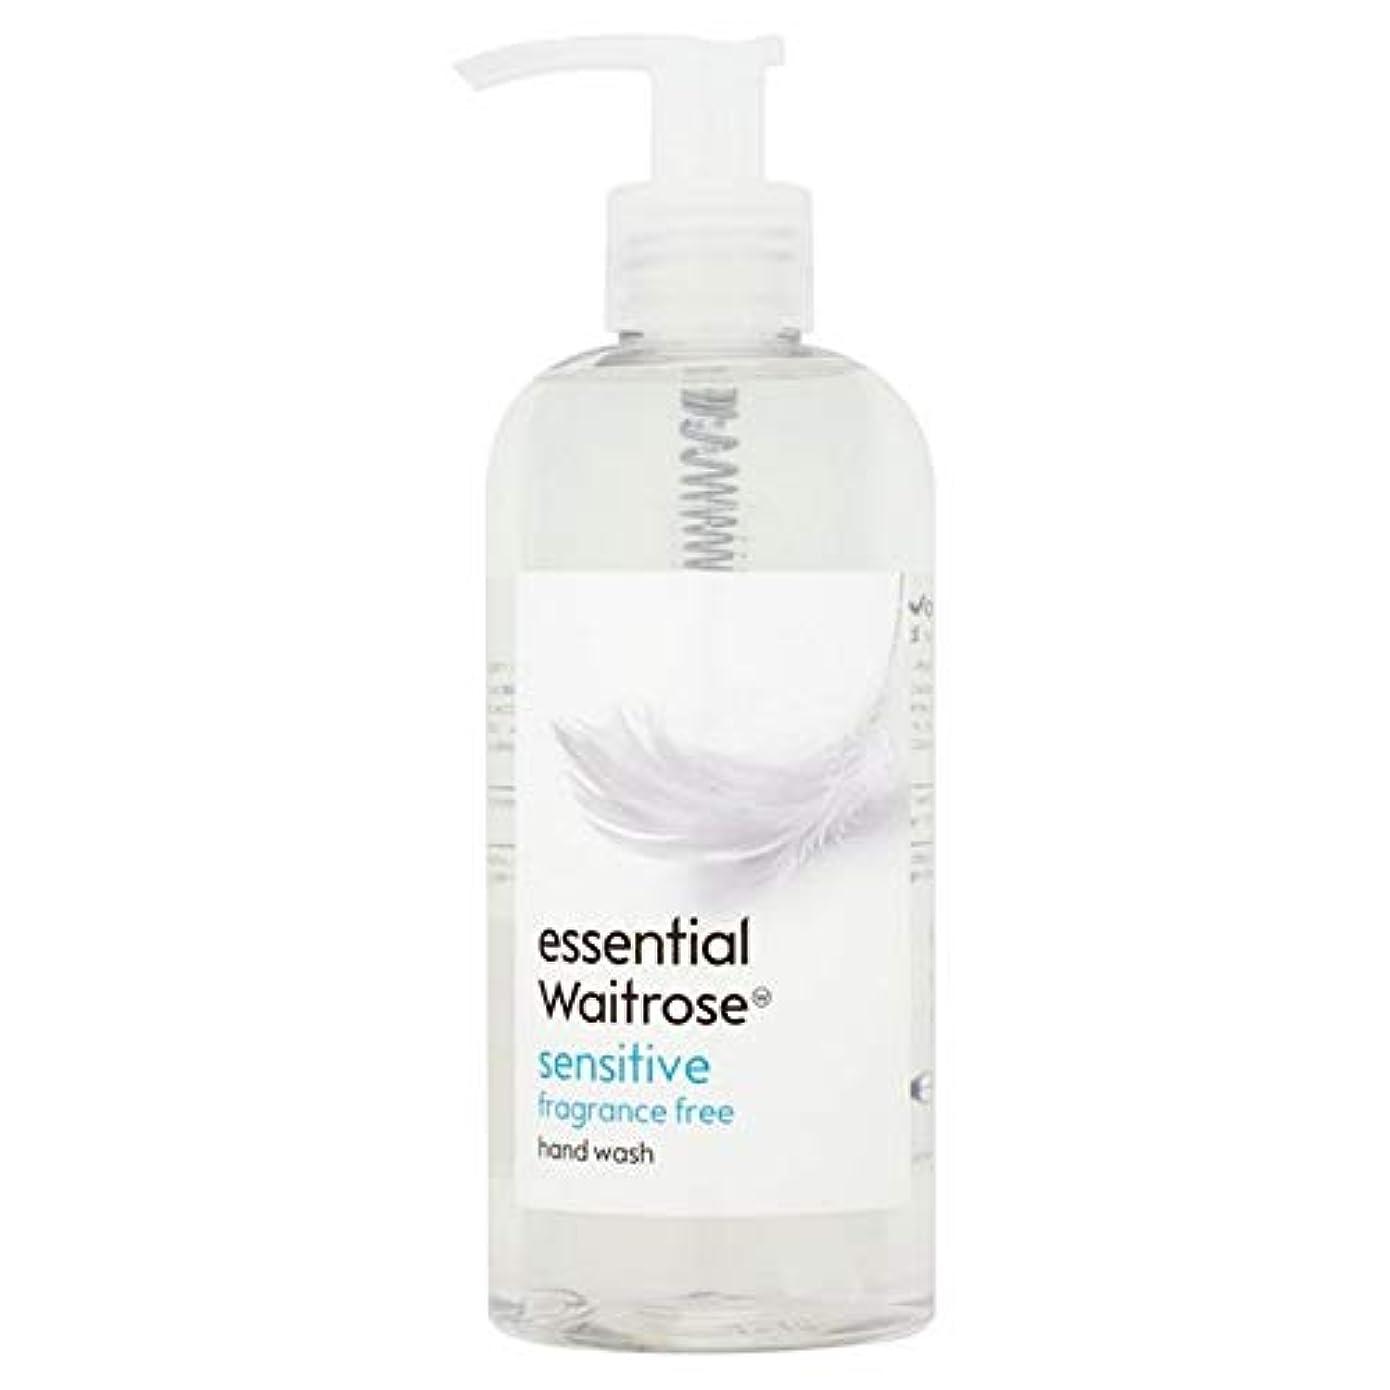 [Waitrose ] 基本的なウェイトローズのハンドウォッシュ敏感な300ミリリットル - Essential Waitrose Hand Wash Sensitive 300ml [並行輸入品]